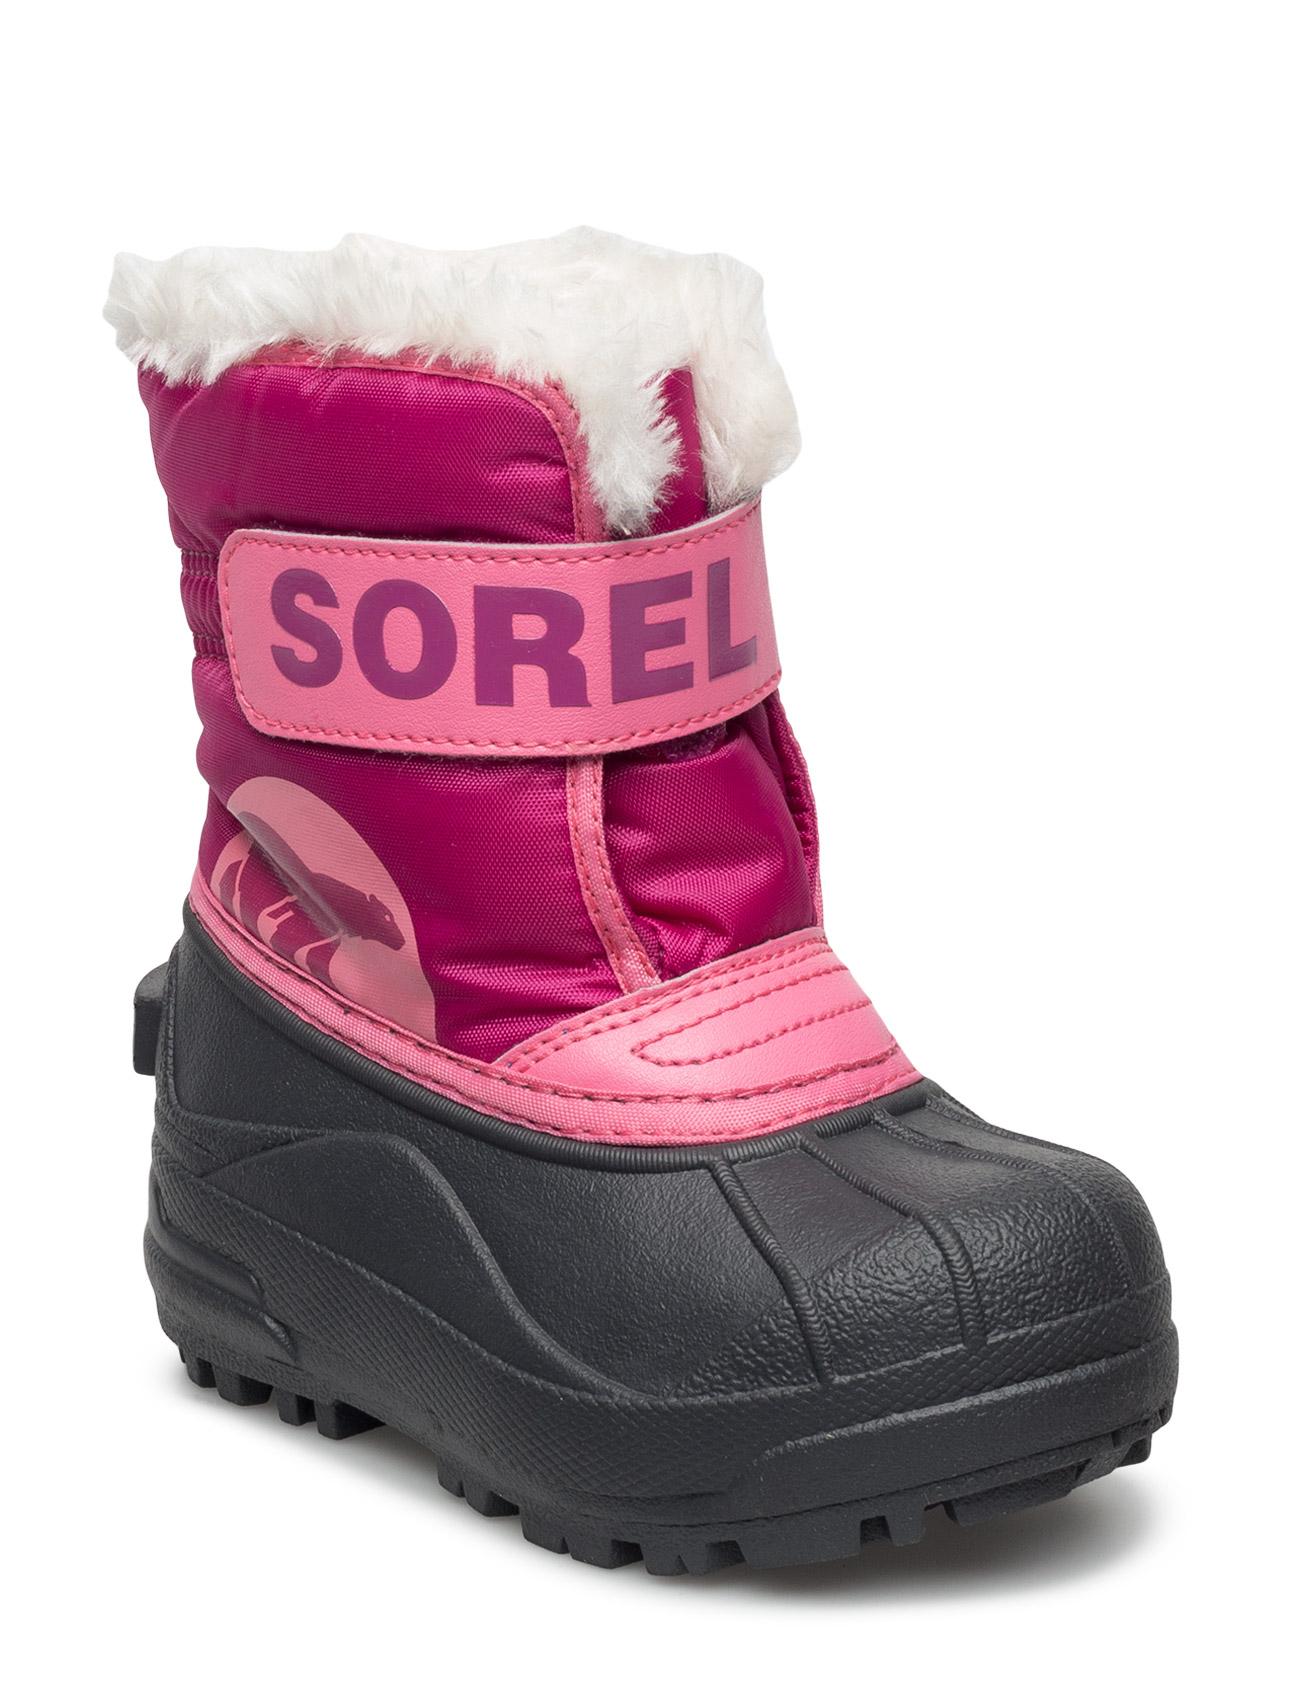 Sorel Childrens Snow Commander TROPIC PINK DEEP BLUSH  664801bdf7